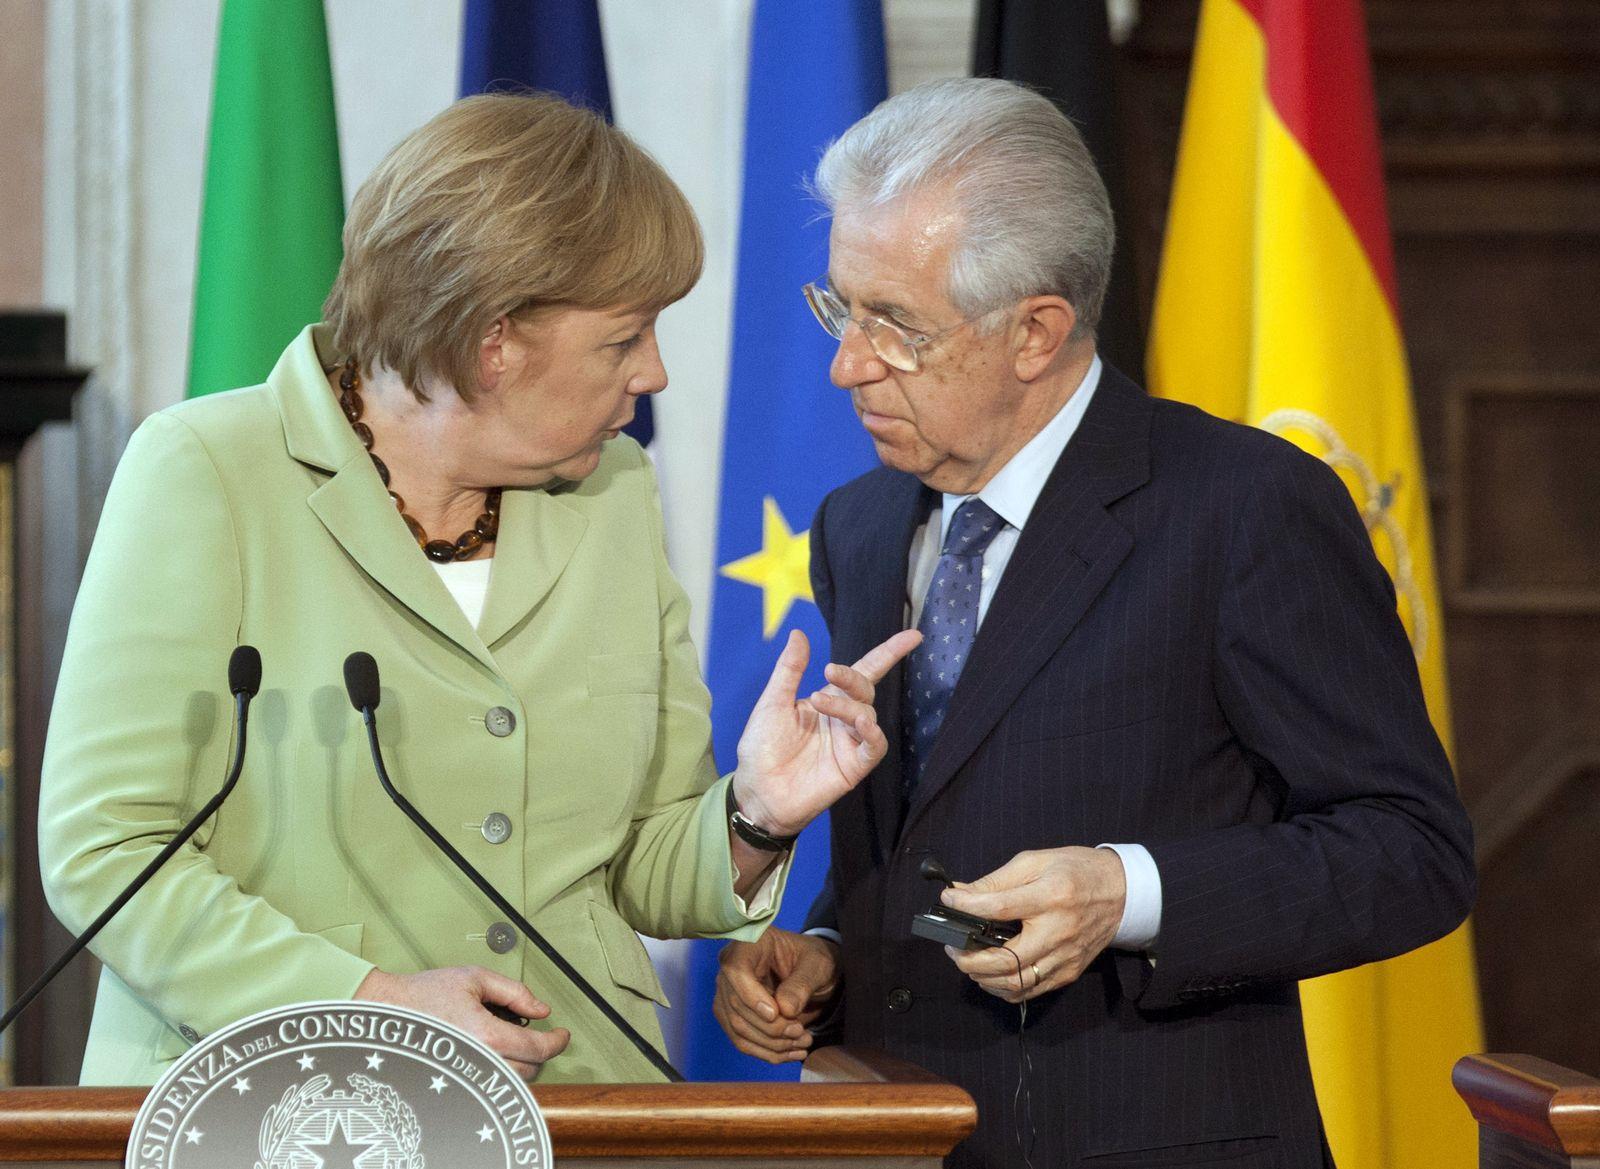 Merkel / Monti